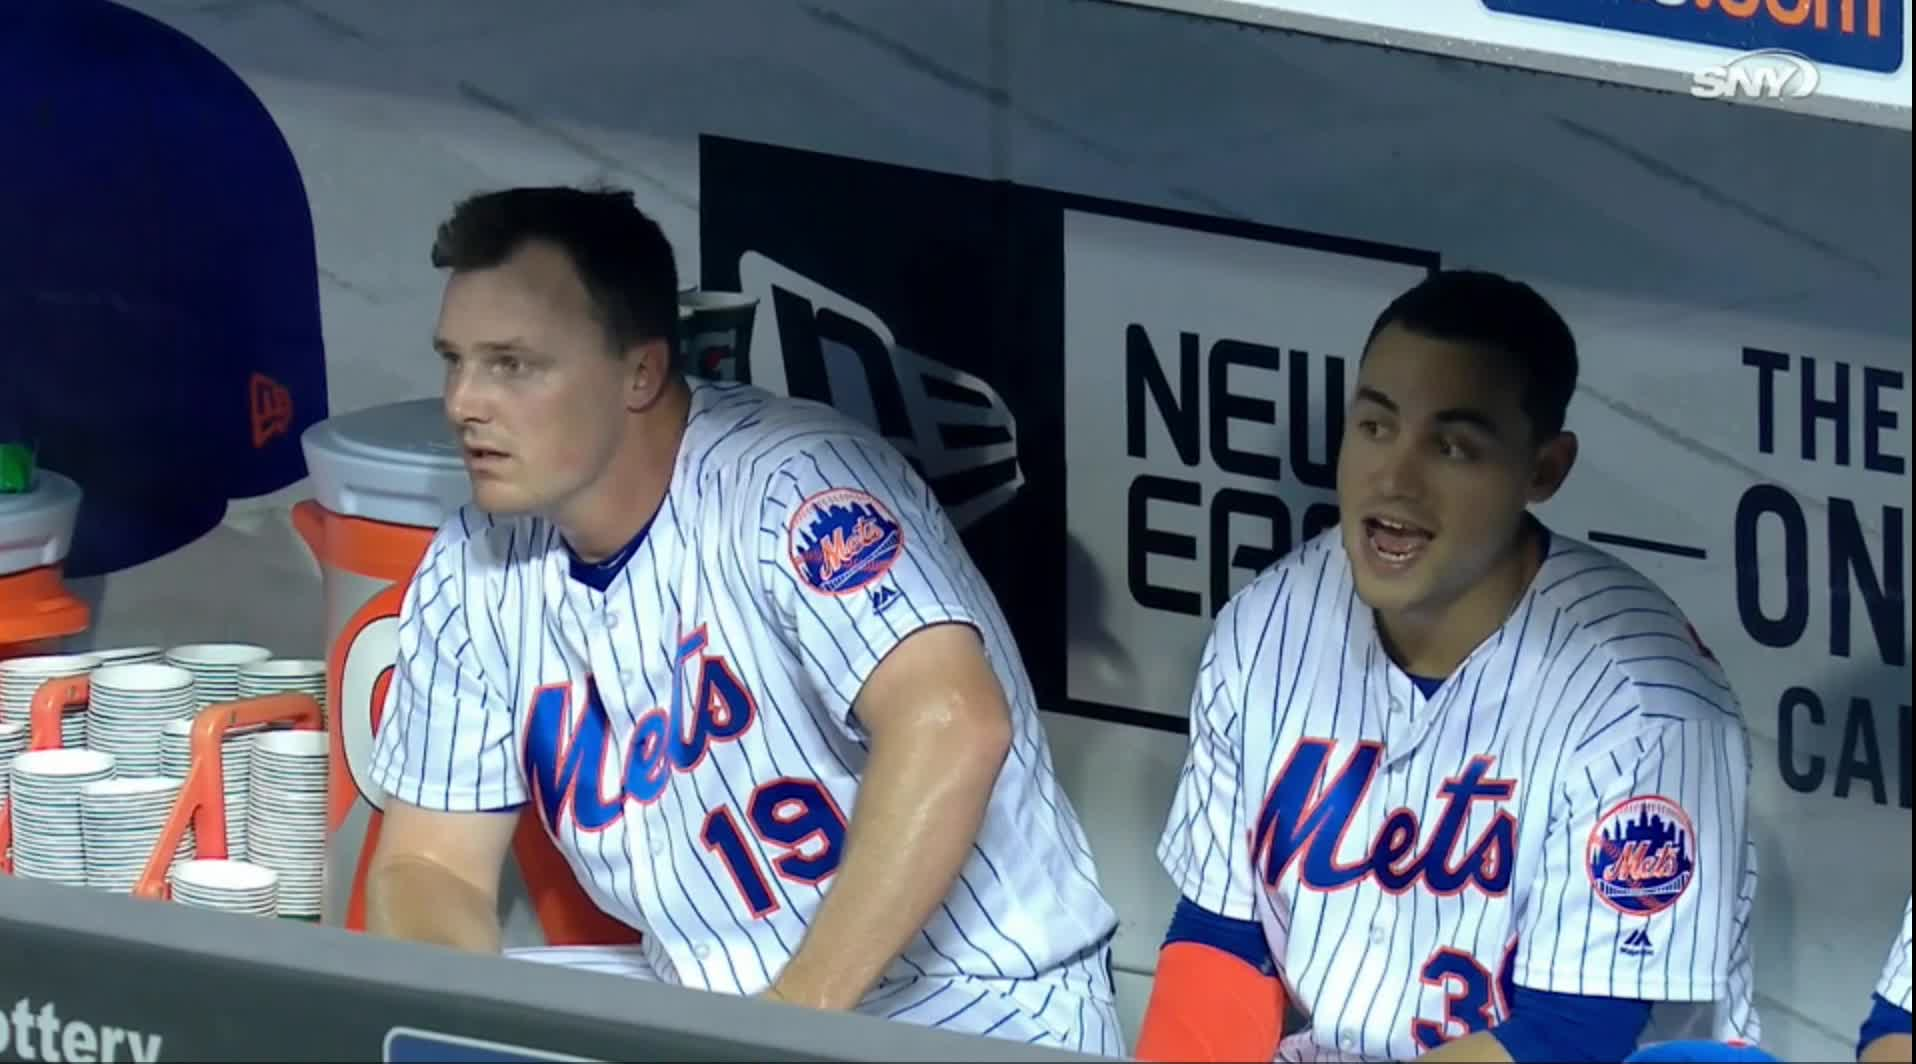 baseballgifs, Mets Golf Clap GIFs